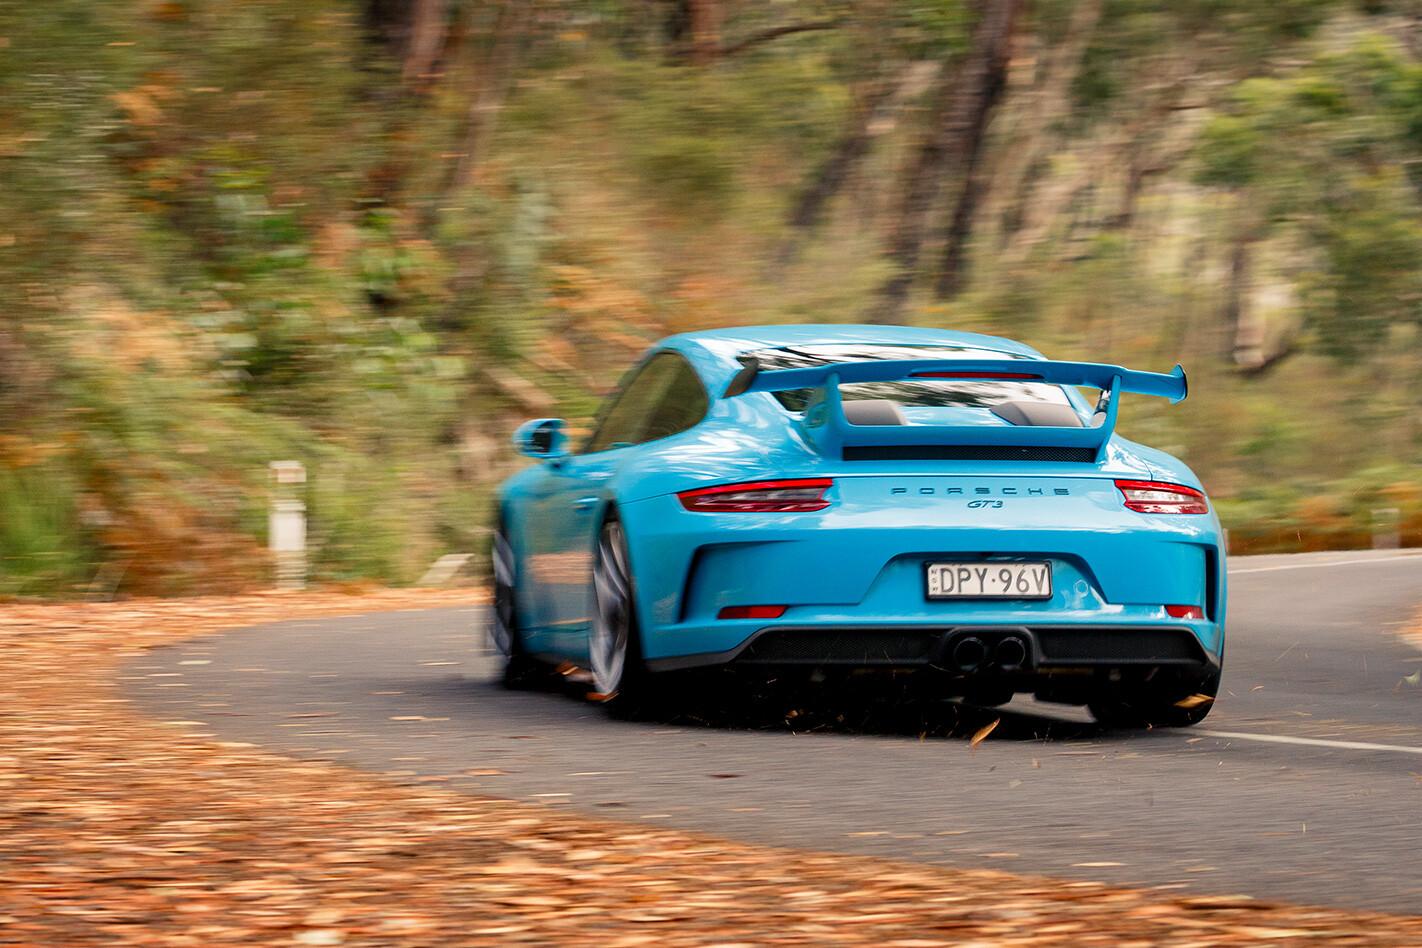 Porsche 911 Gt 3 Corner Jpg